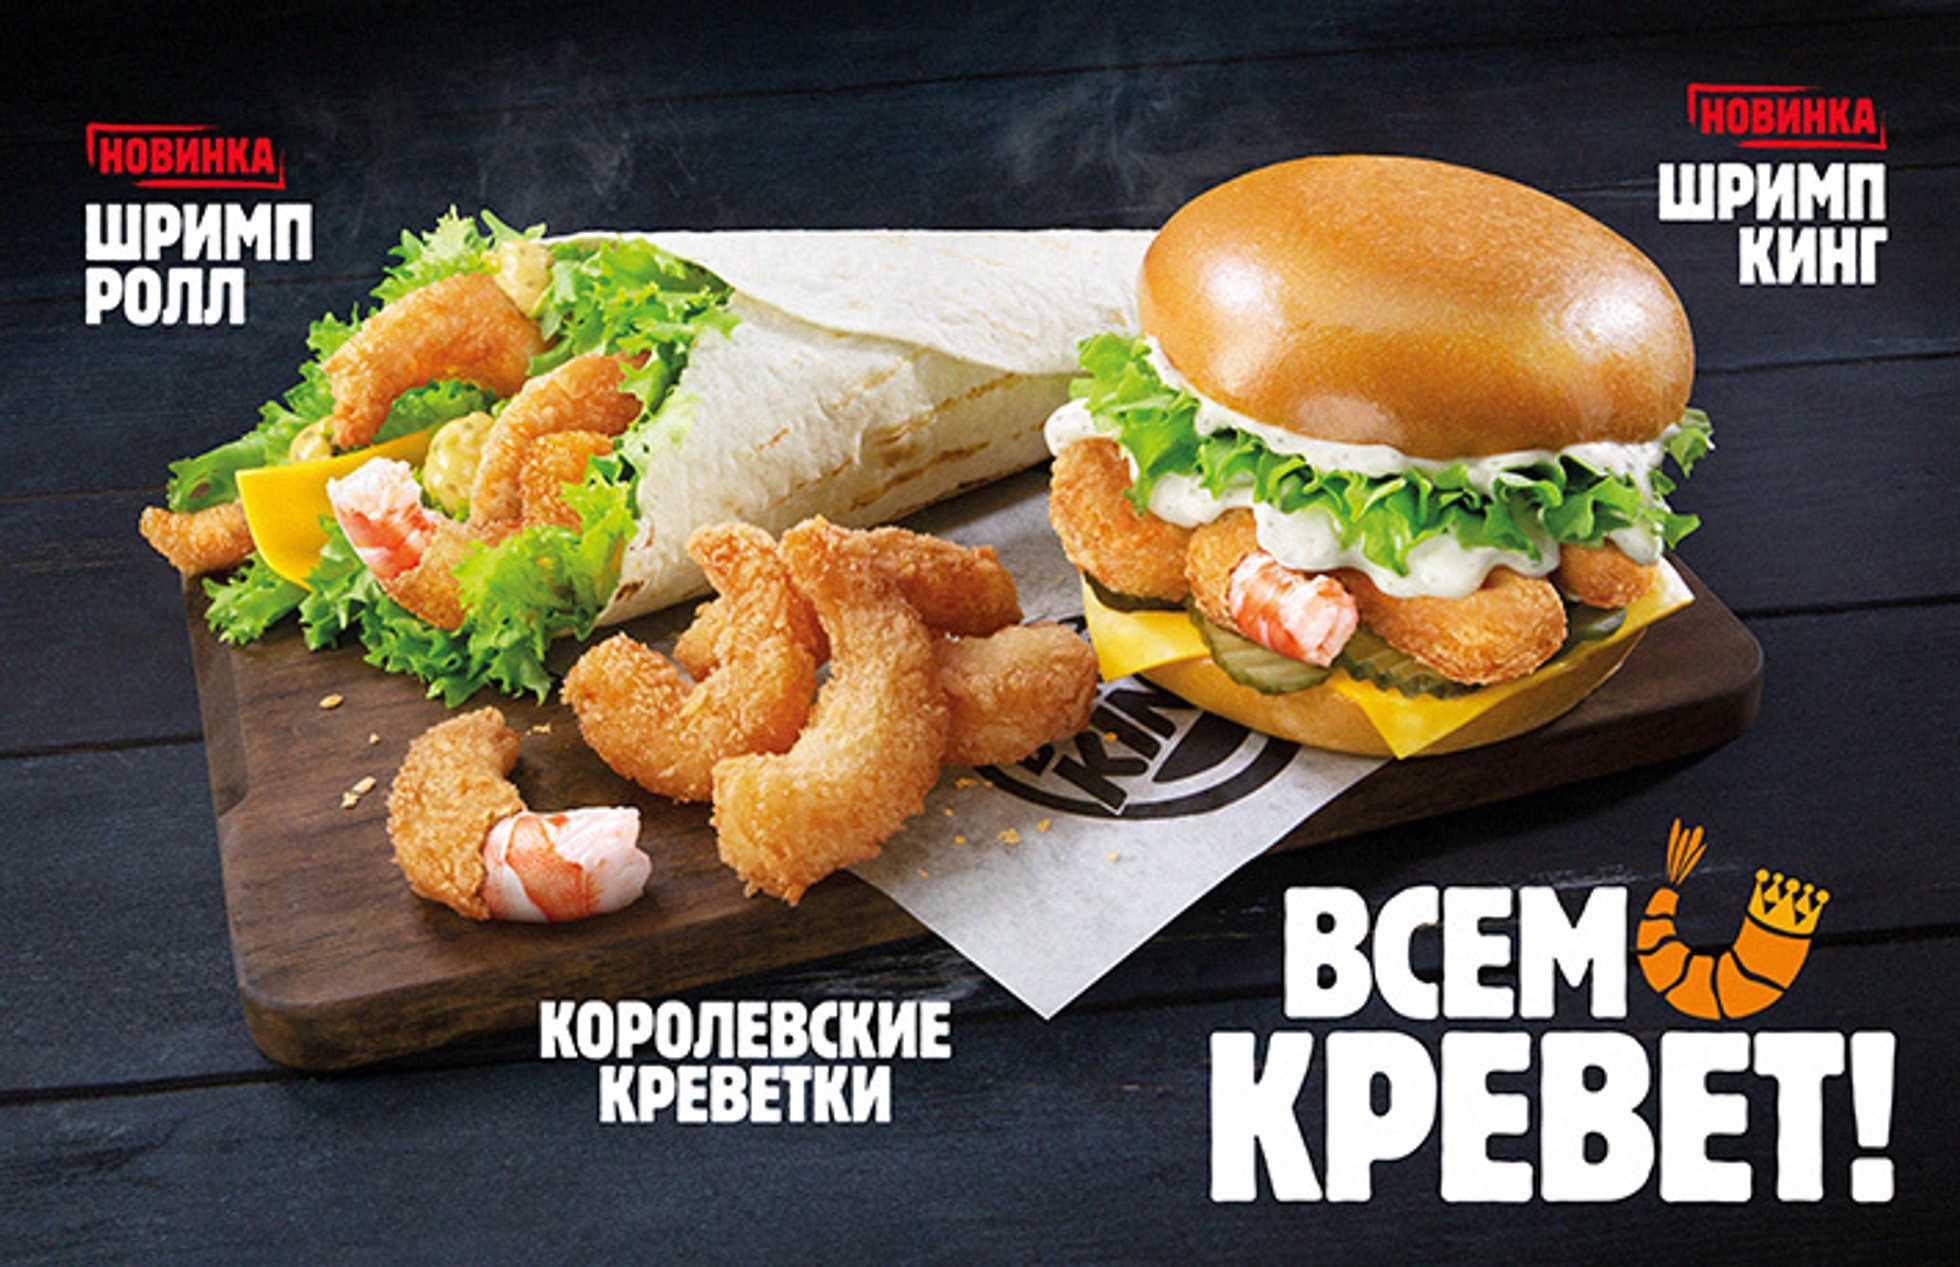 Бургер Кинг - каталог действителен с 01.10.2020 по 31.10.2020 - страница 1.